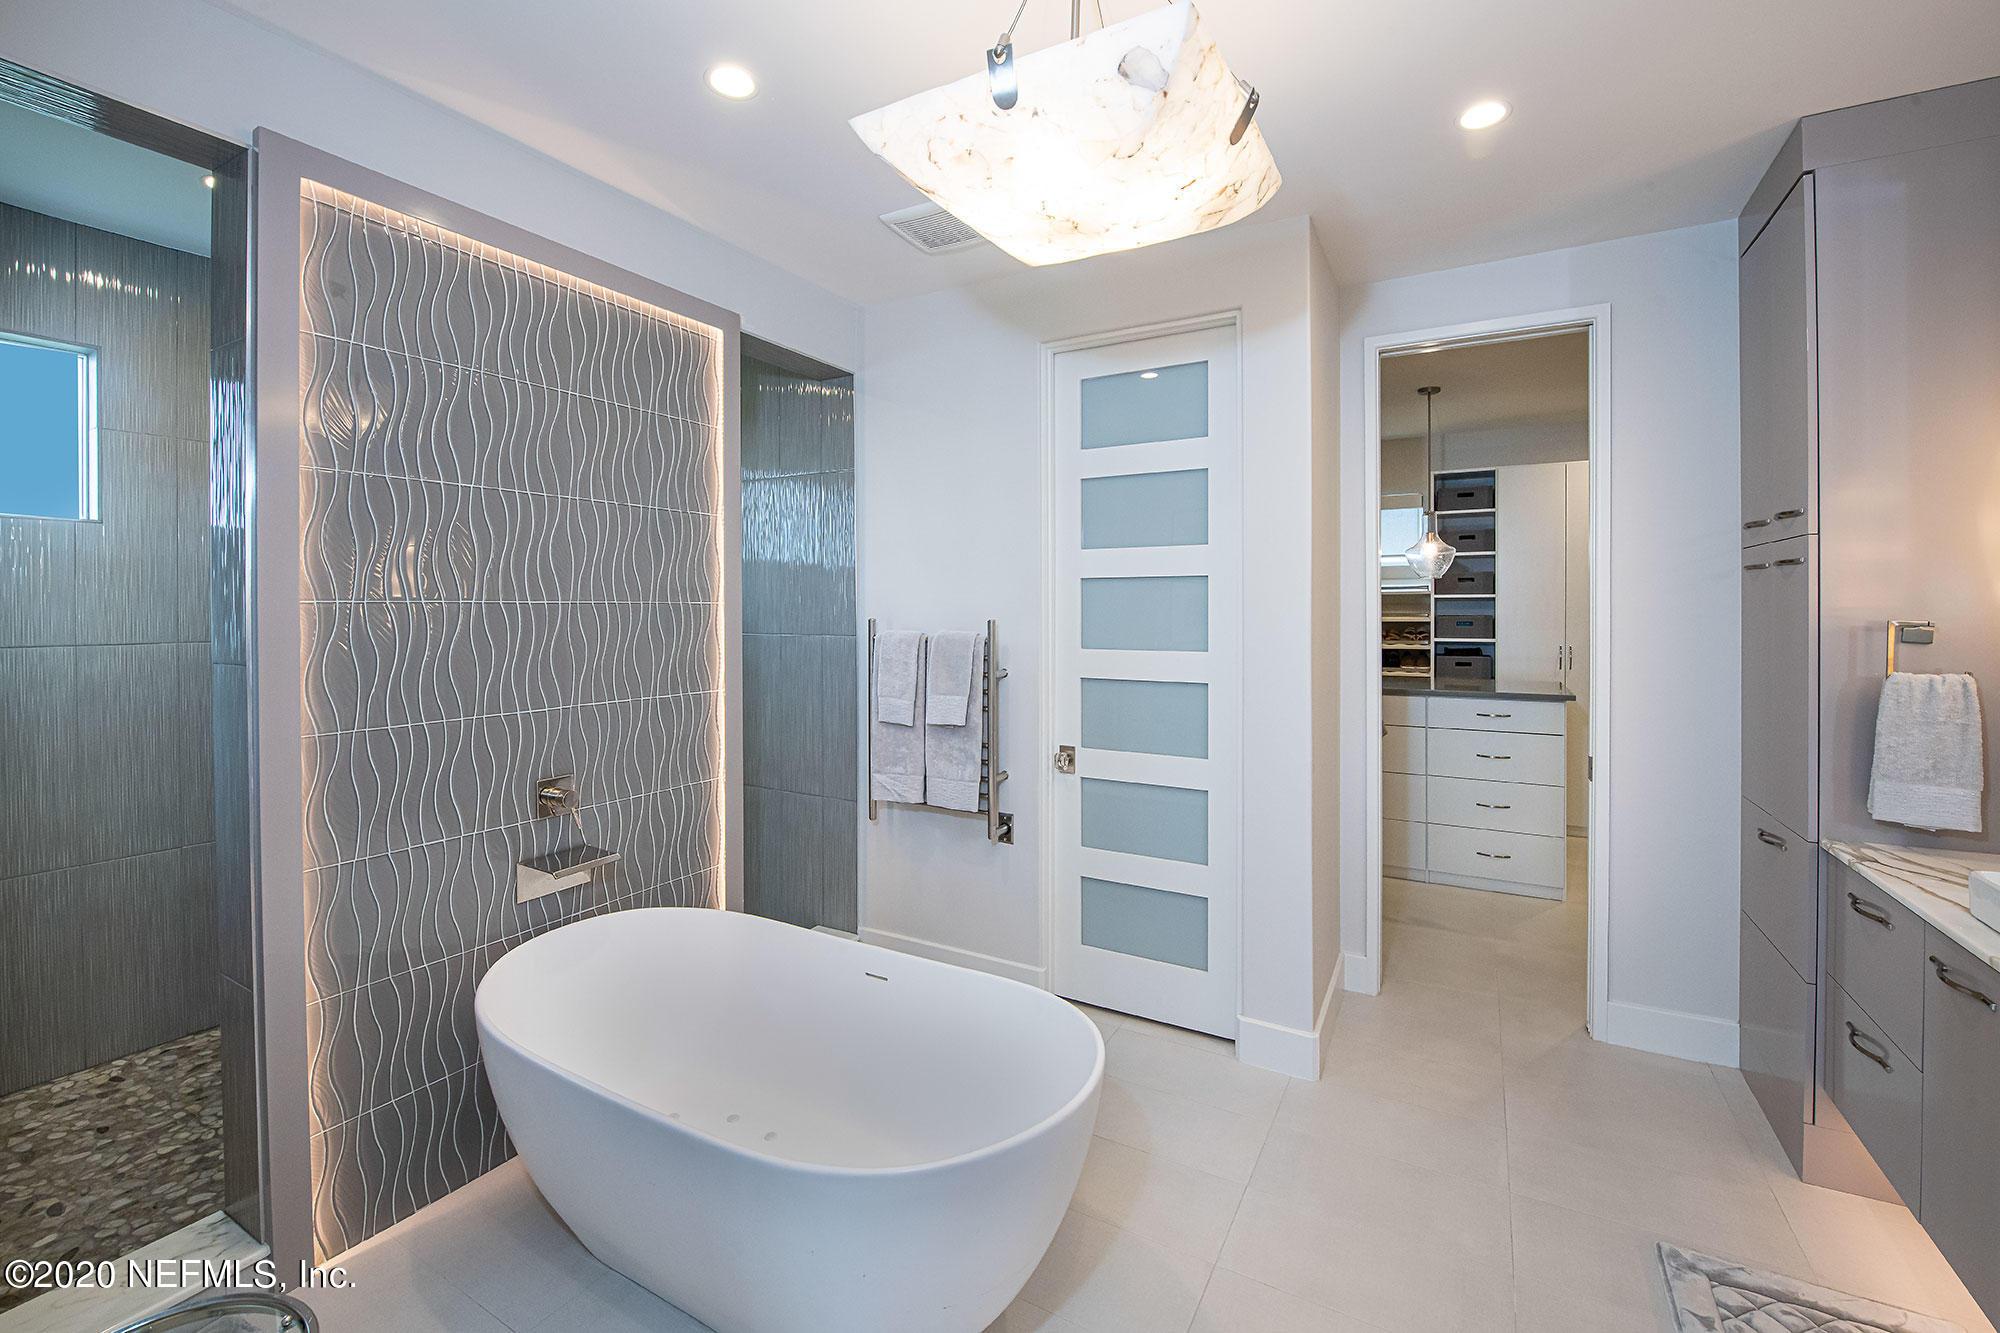 2385 PONTE VEDRA, PONTE VEDRA BEACH, FLORIDA 32082, 5 Bedrooms Bedrooms, ,5 BathroomsBathrooms,Residential,For sale,PONTE VEDRA,1088056